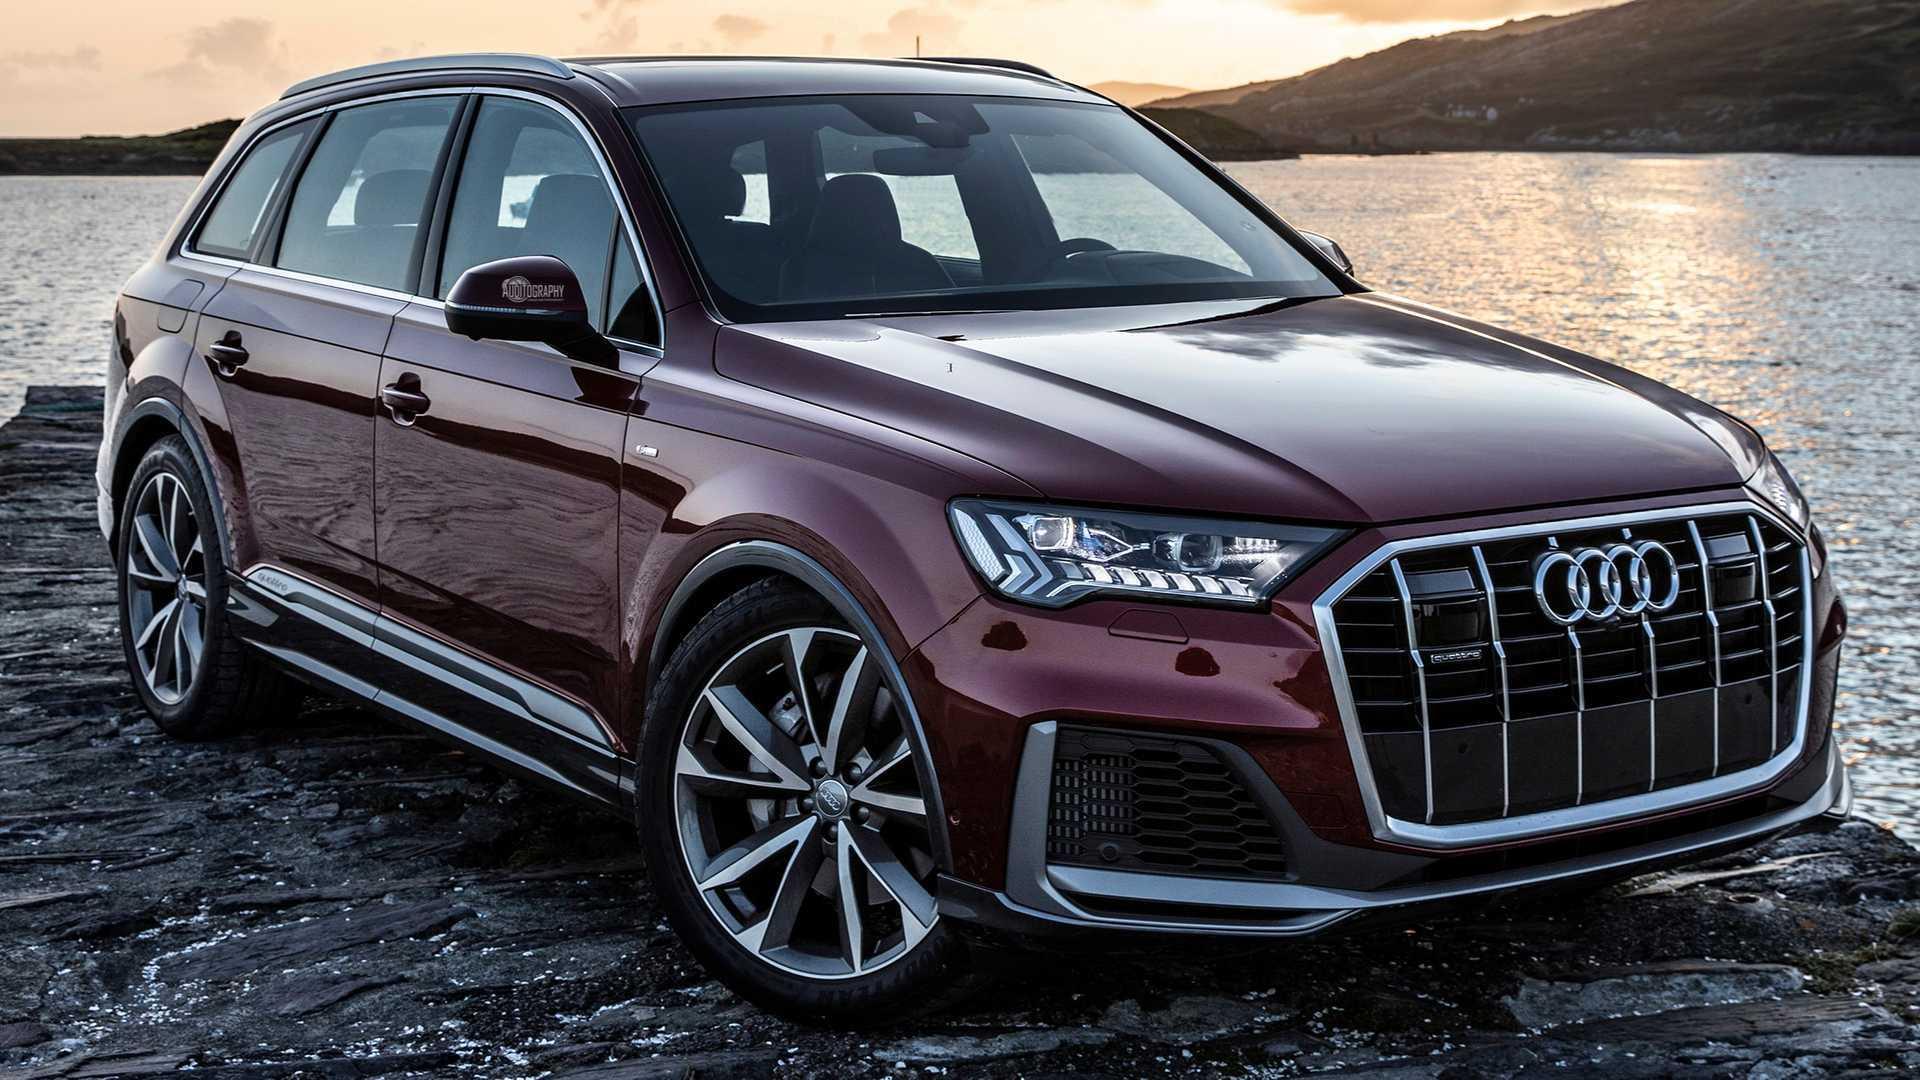 Audi Suv Q7 >> 2020 Audi Q7 Matador Red Poses For The Camera To Show Big Update